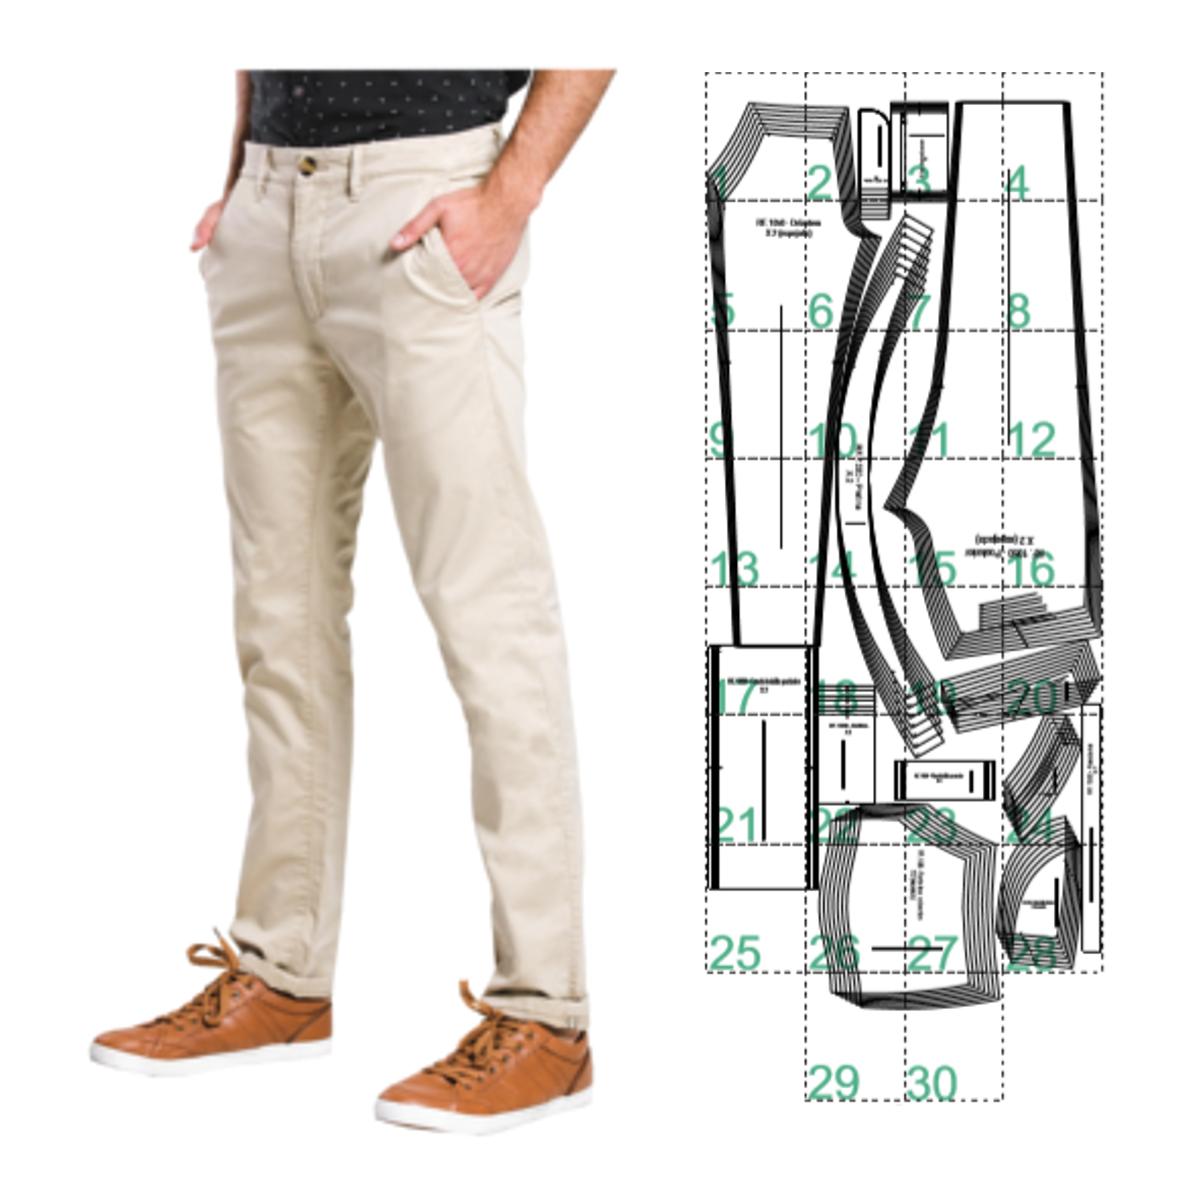 Pantalon Dril De Hombre Ref 1050 Patrones Confecciones Cursos Online De Costura Pantalones Hombres Pantalon Hombre